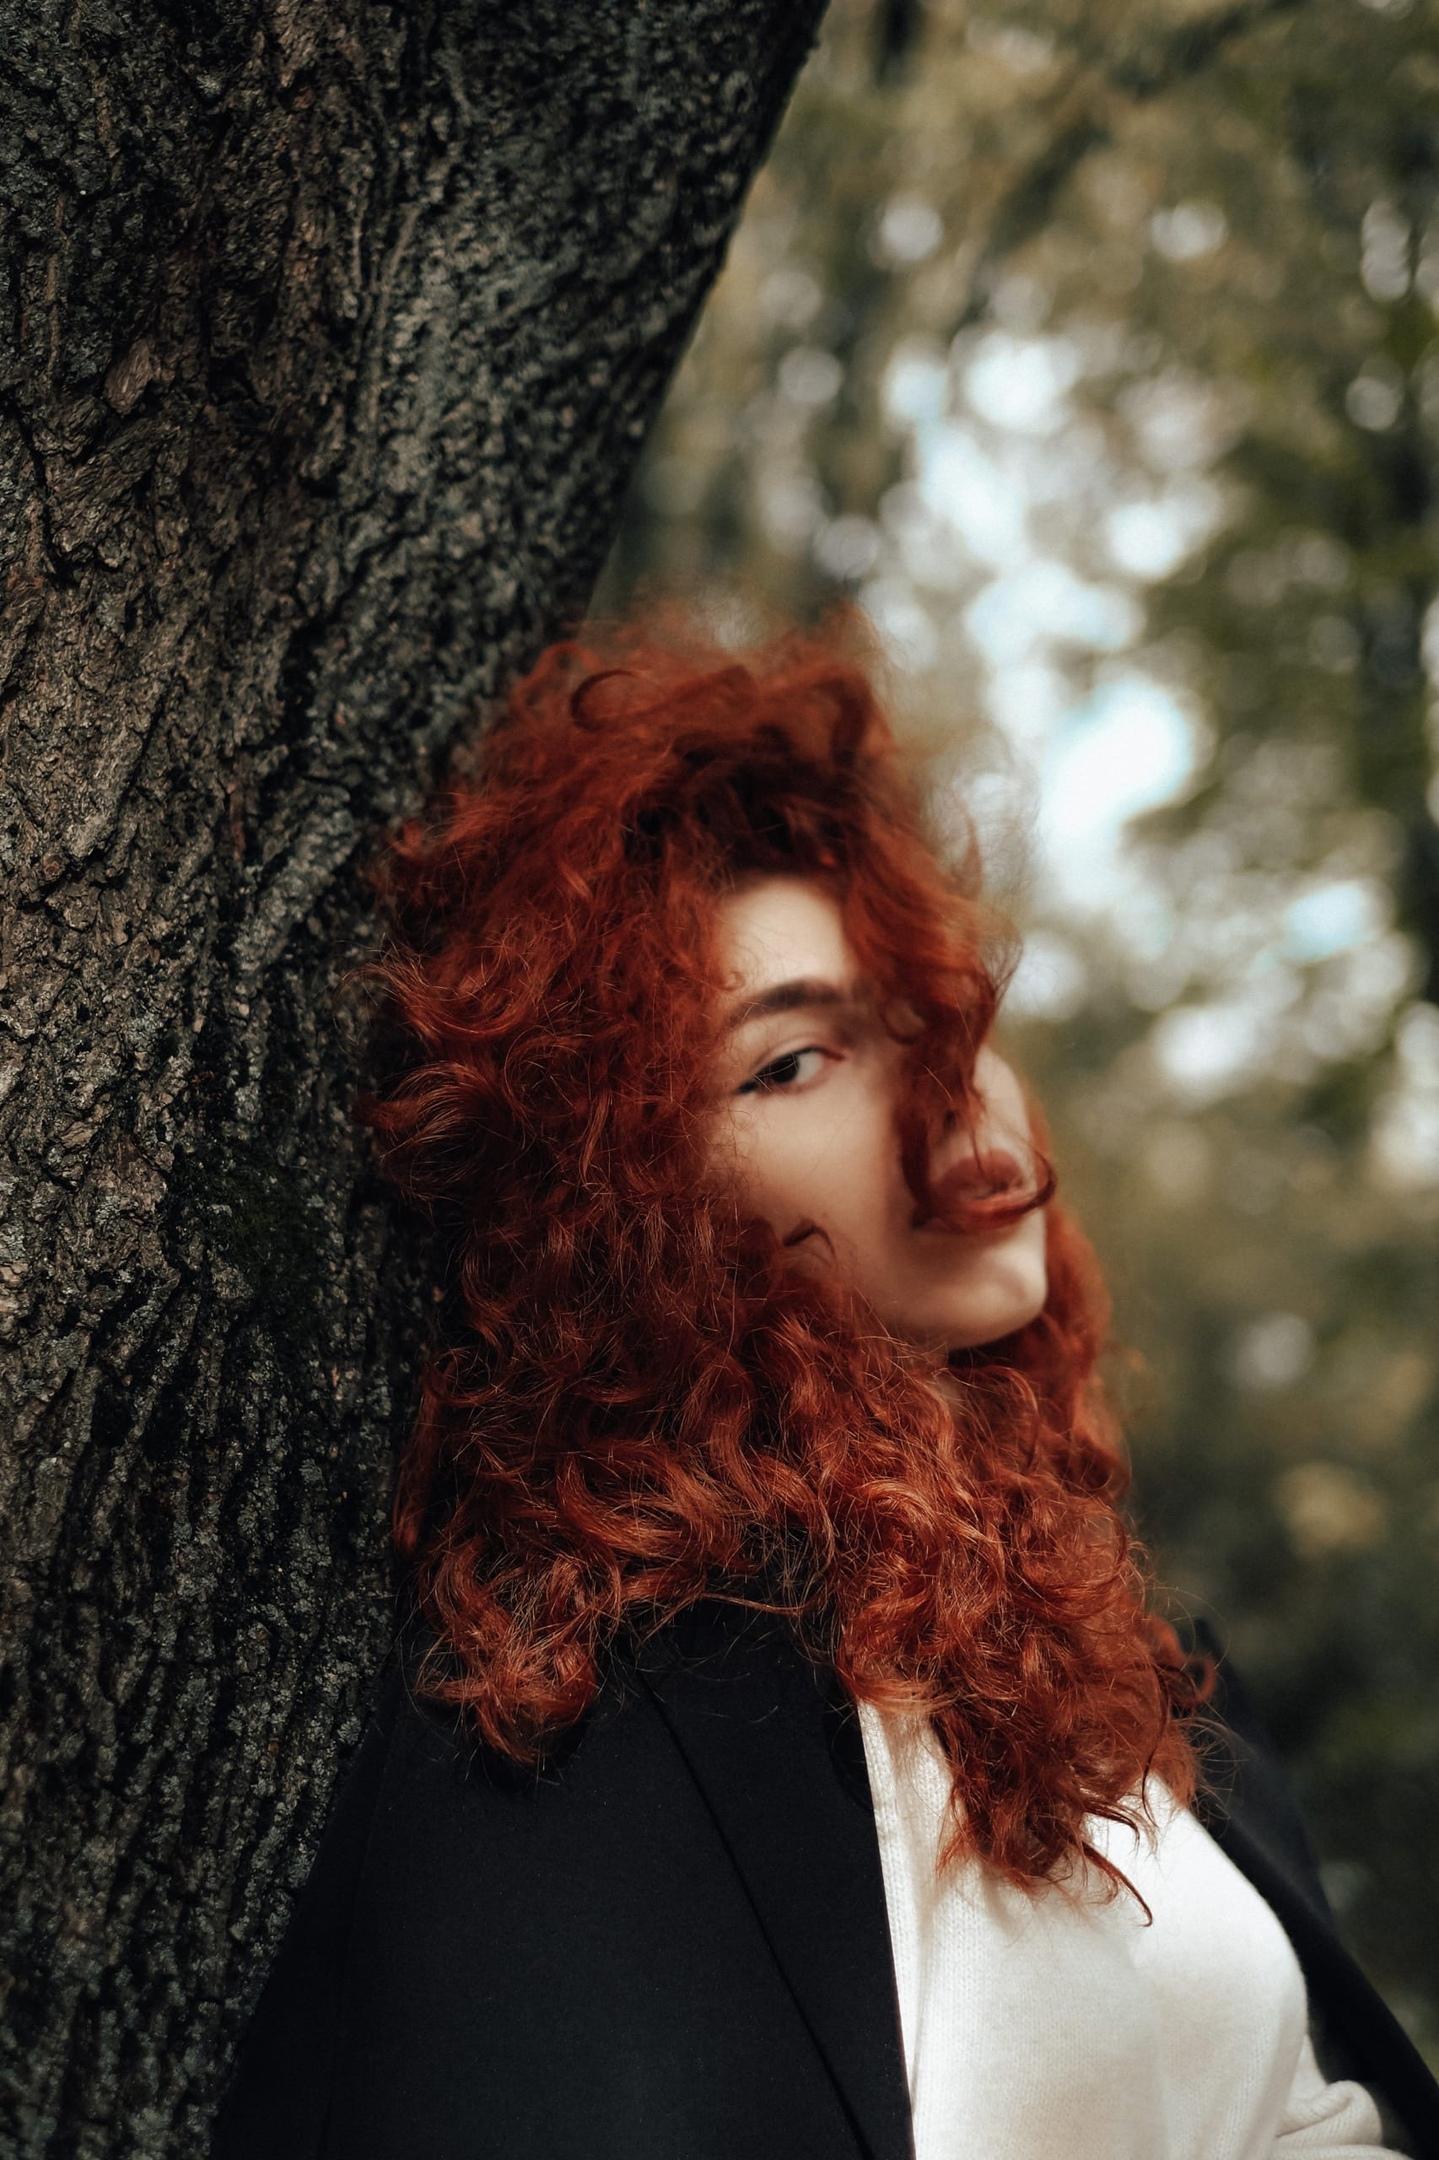 https://www.youngfolks.ru/pub/photographer-darina-bulgakova-115076